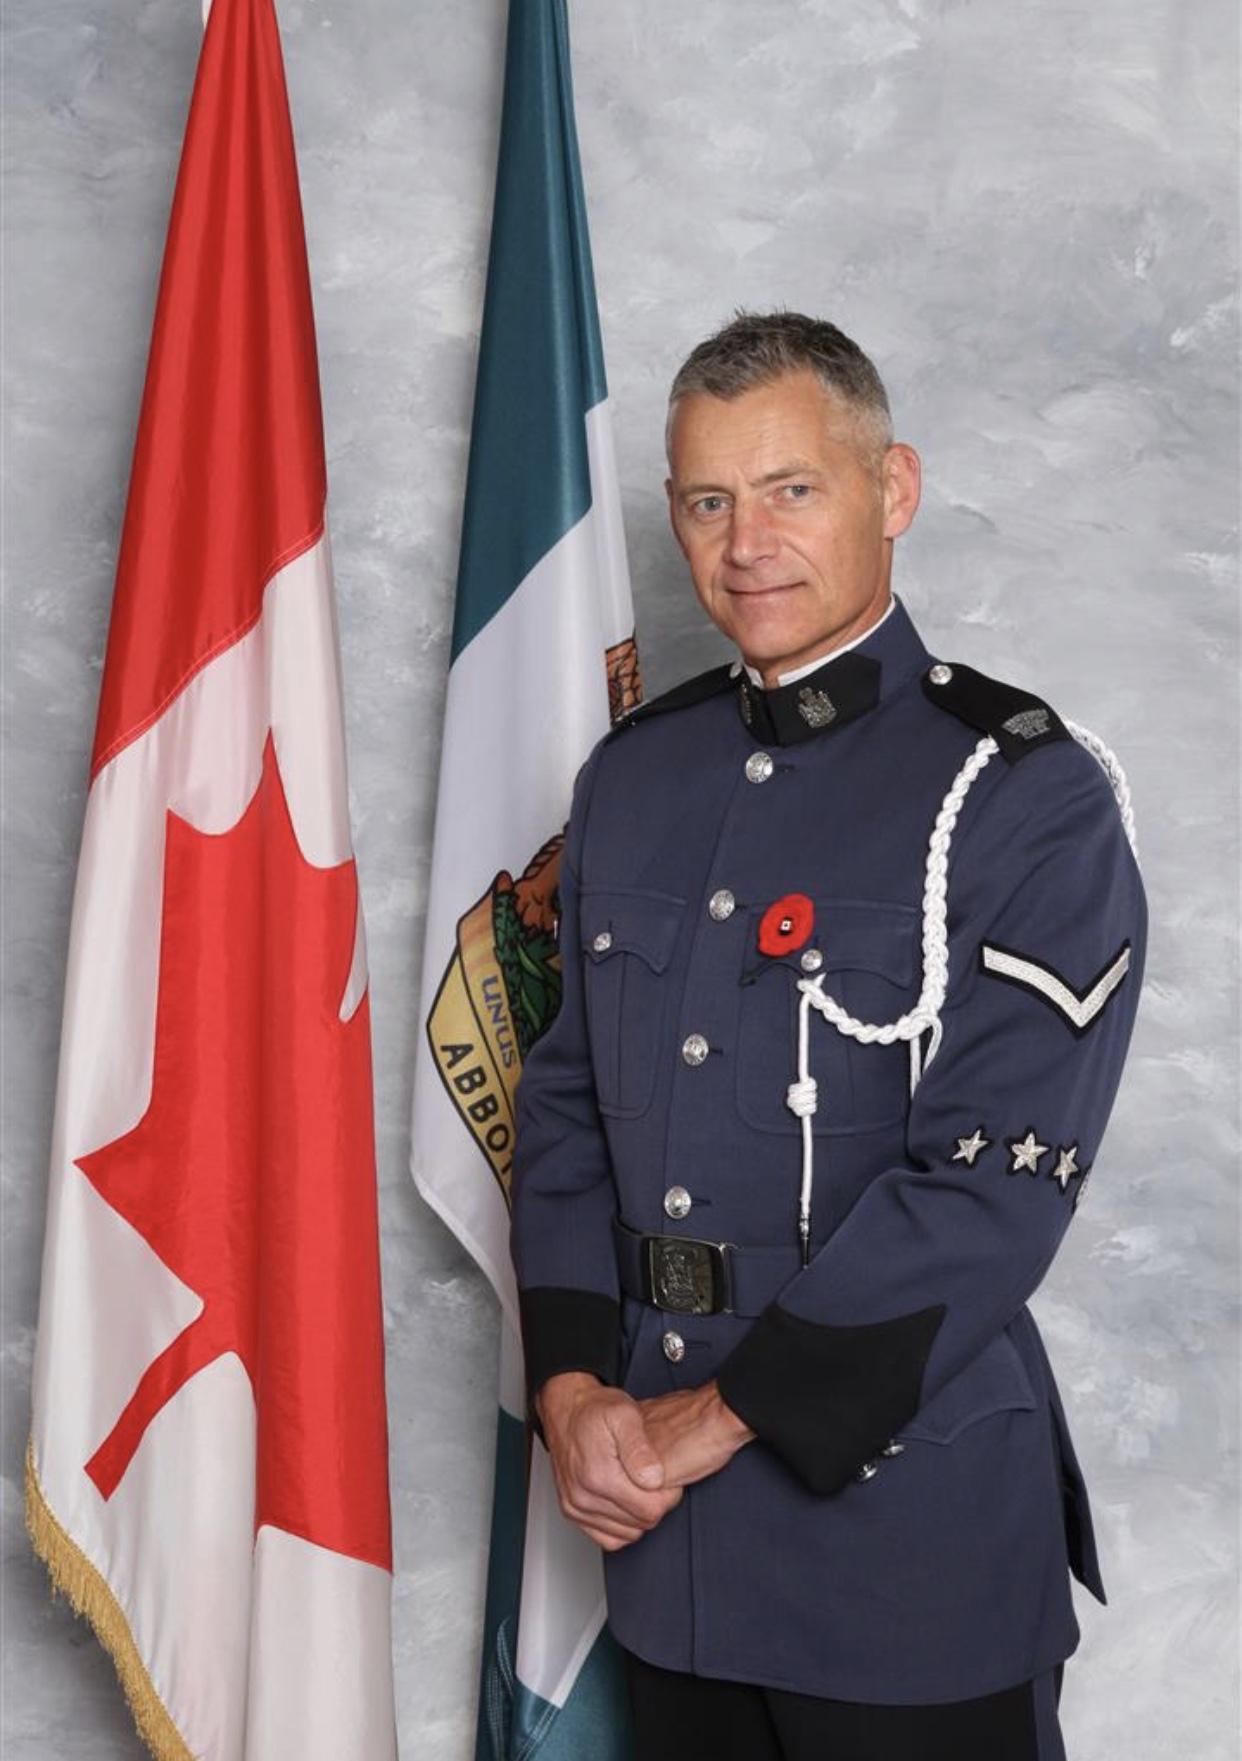 We remember fallen Abbotsford Police Officer Cst. John Davidson.